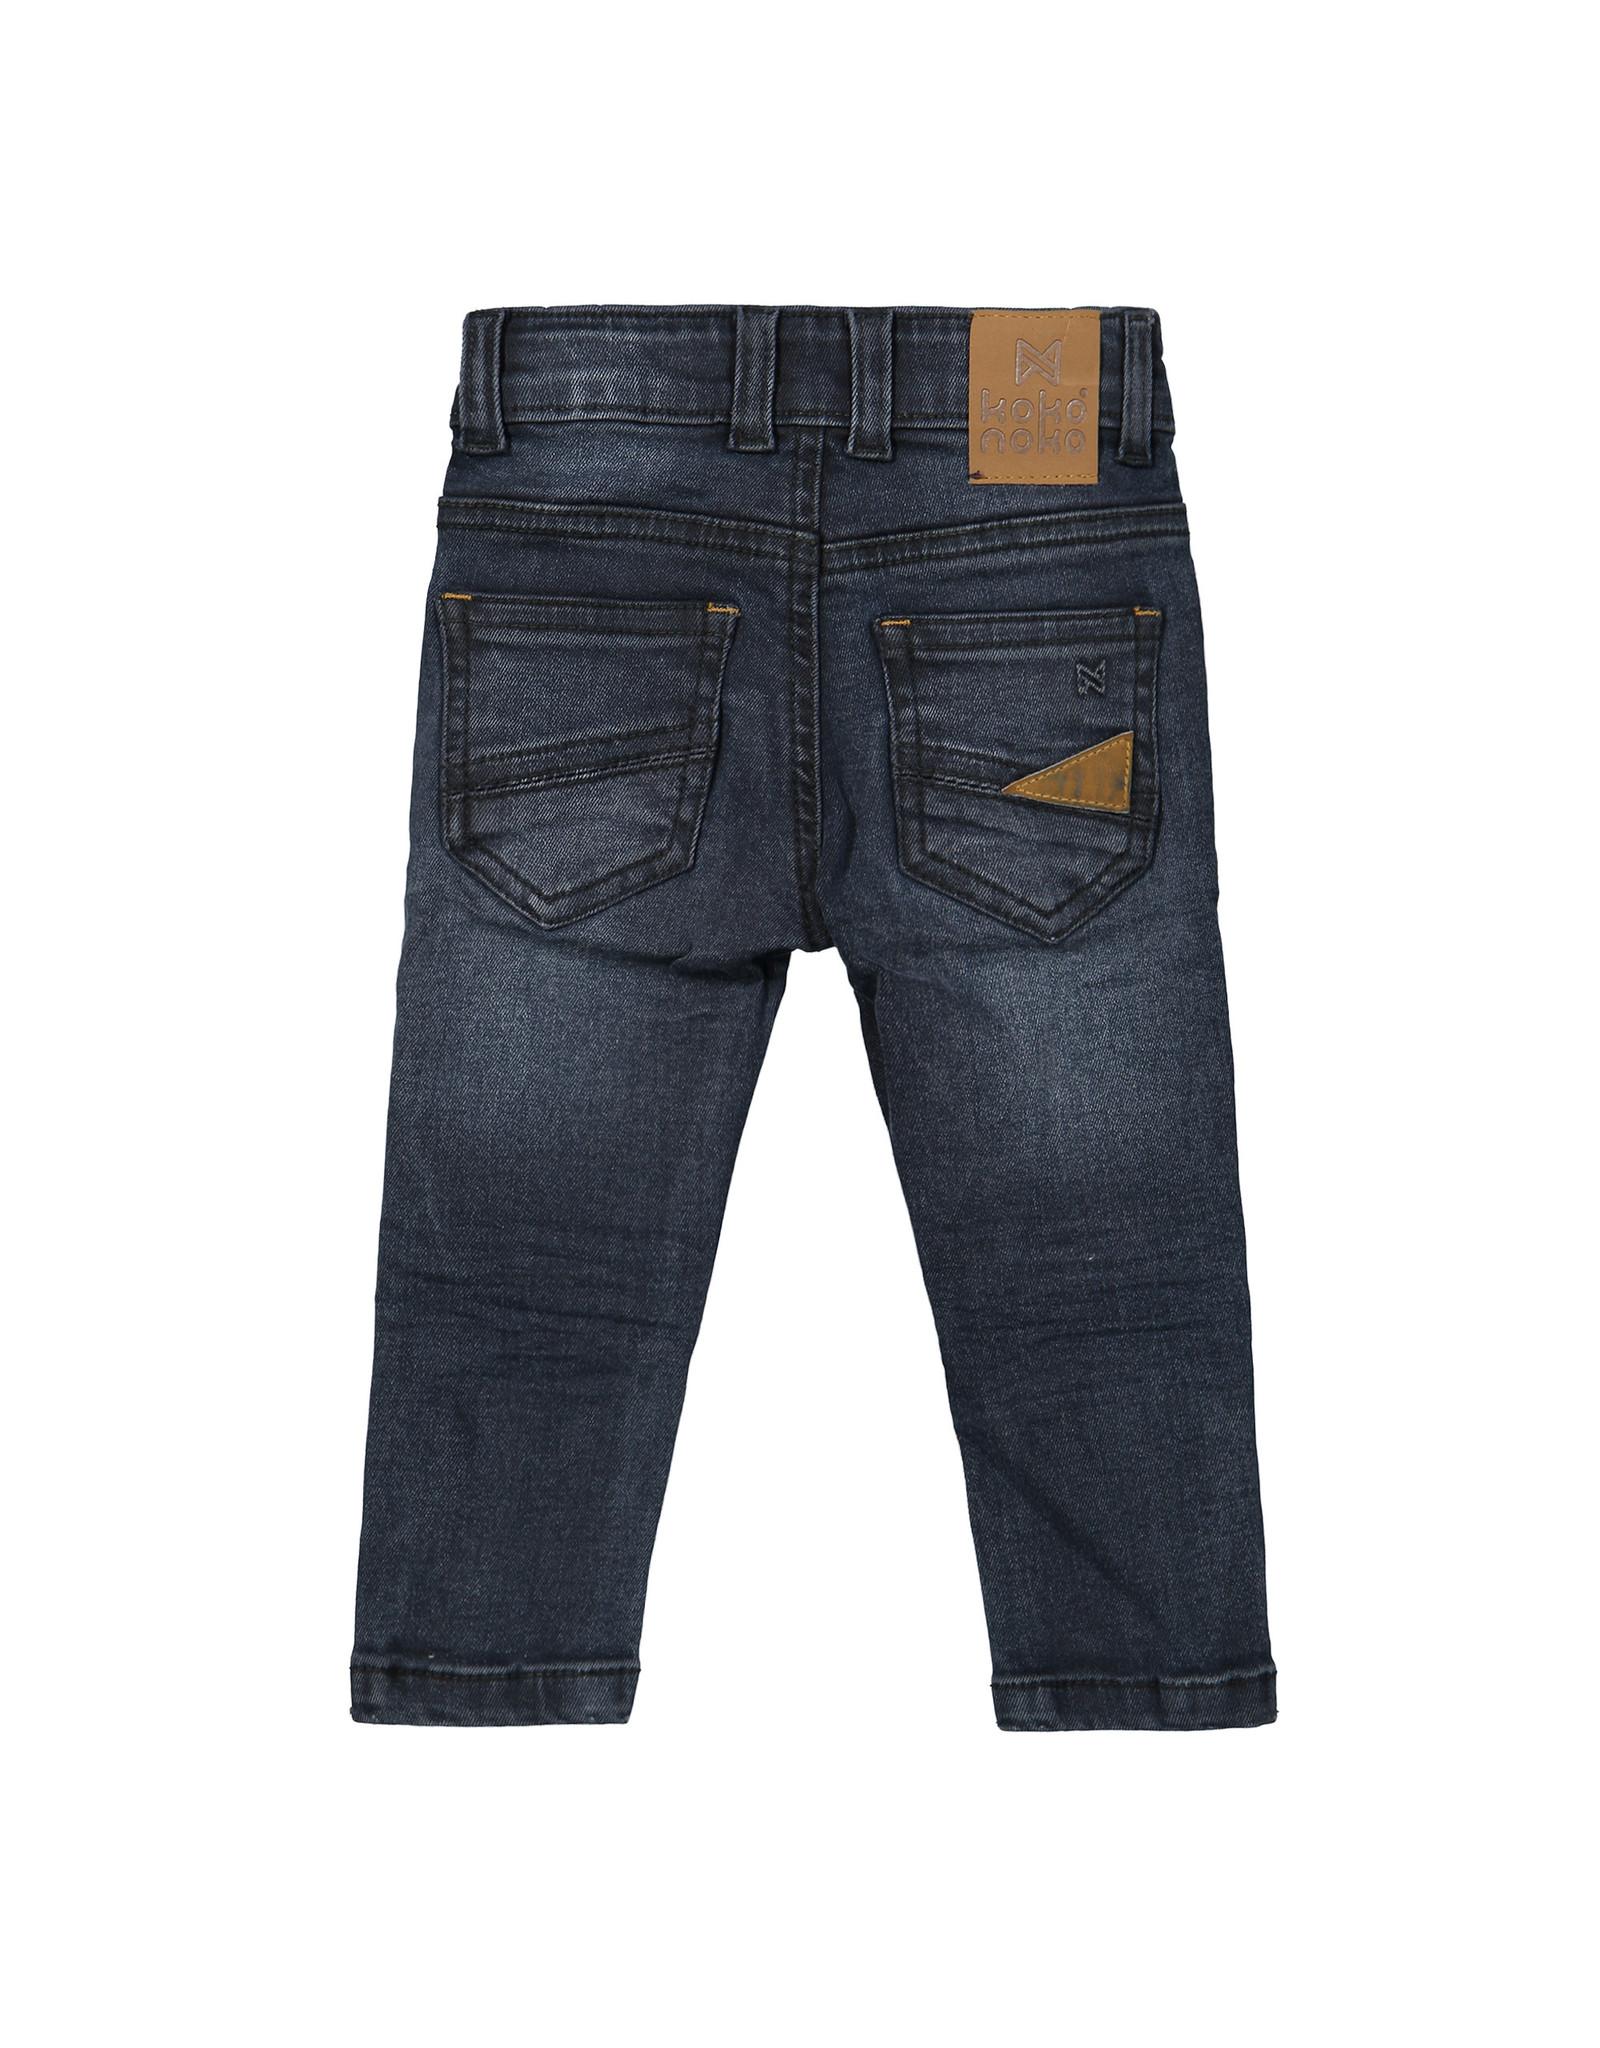 Koko Noko Boys Jeans Darkbluejeans